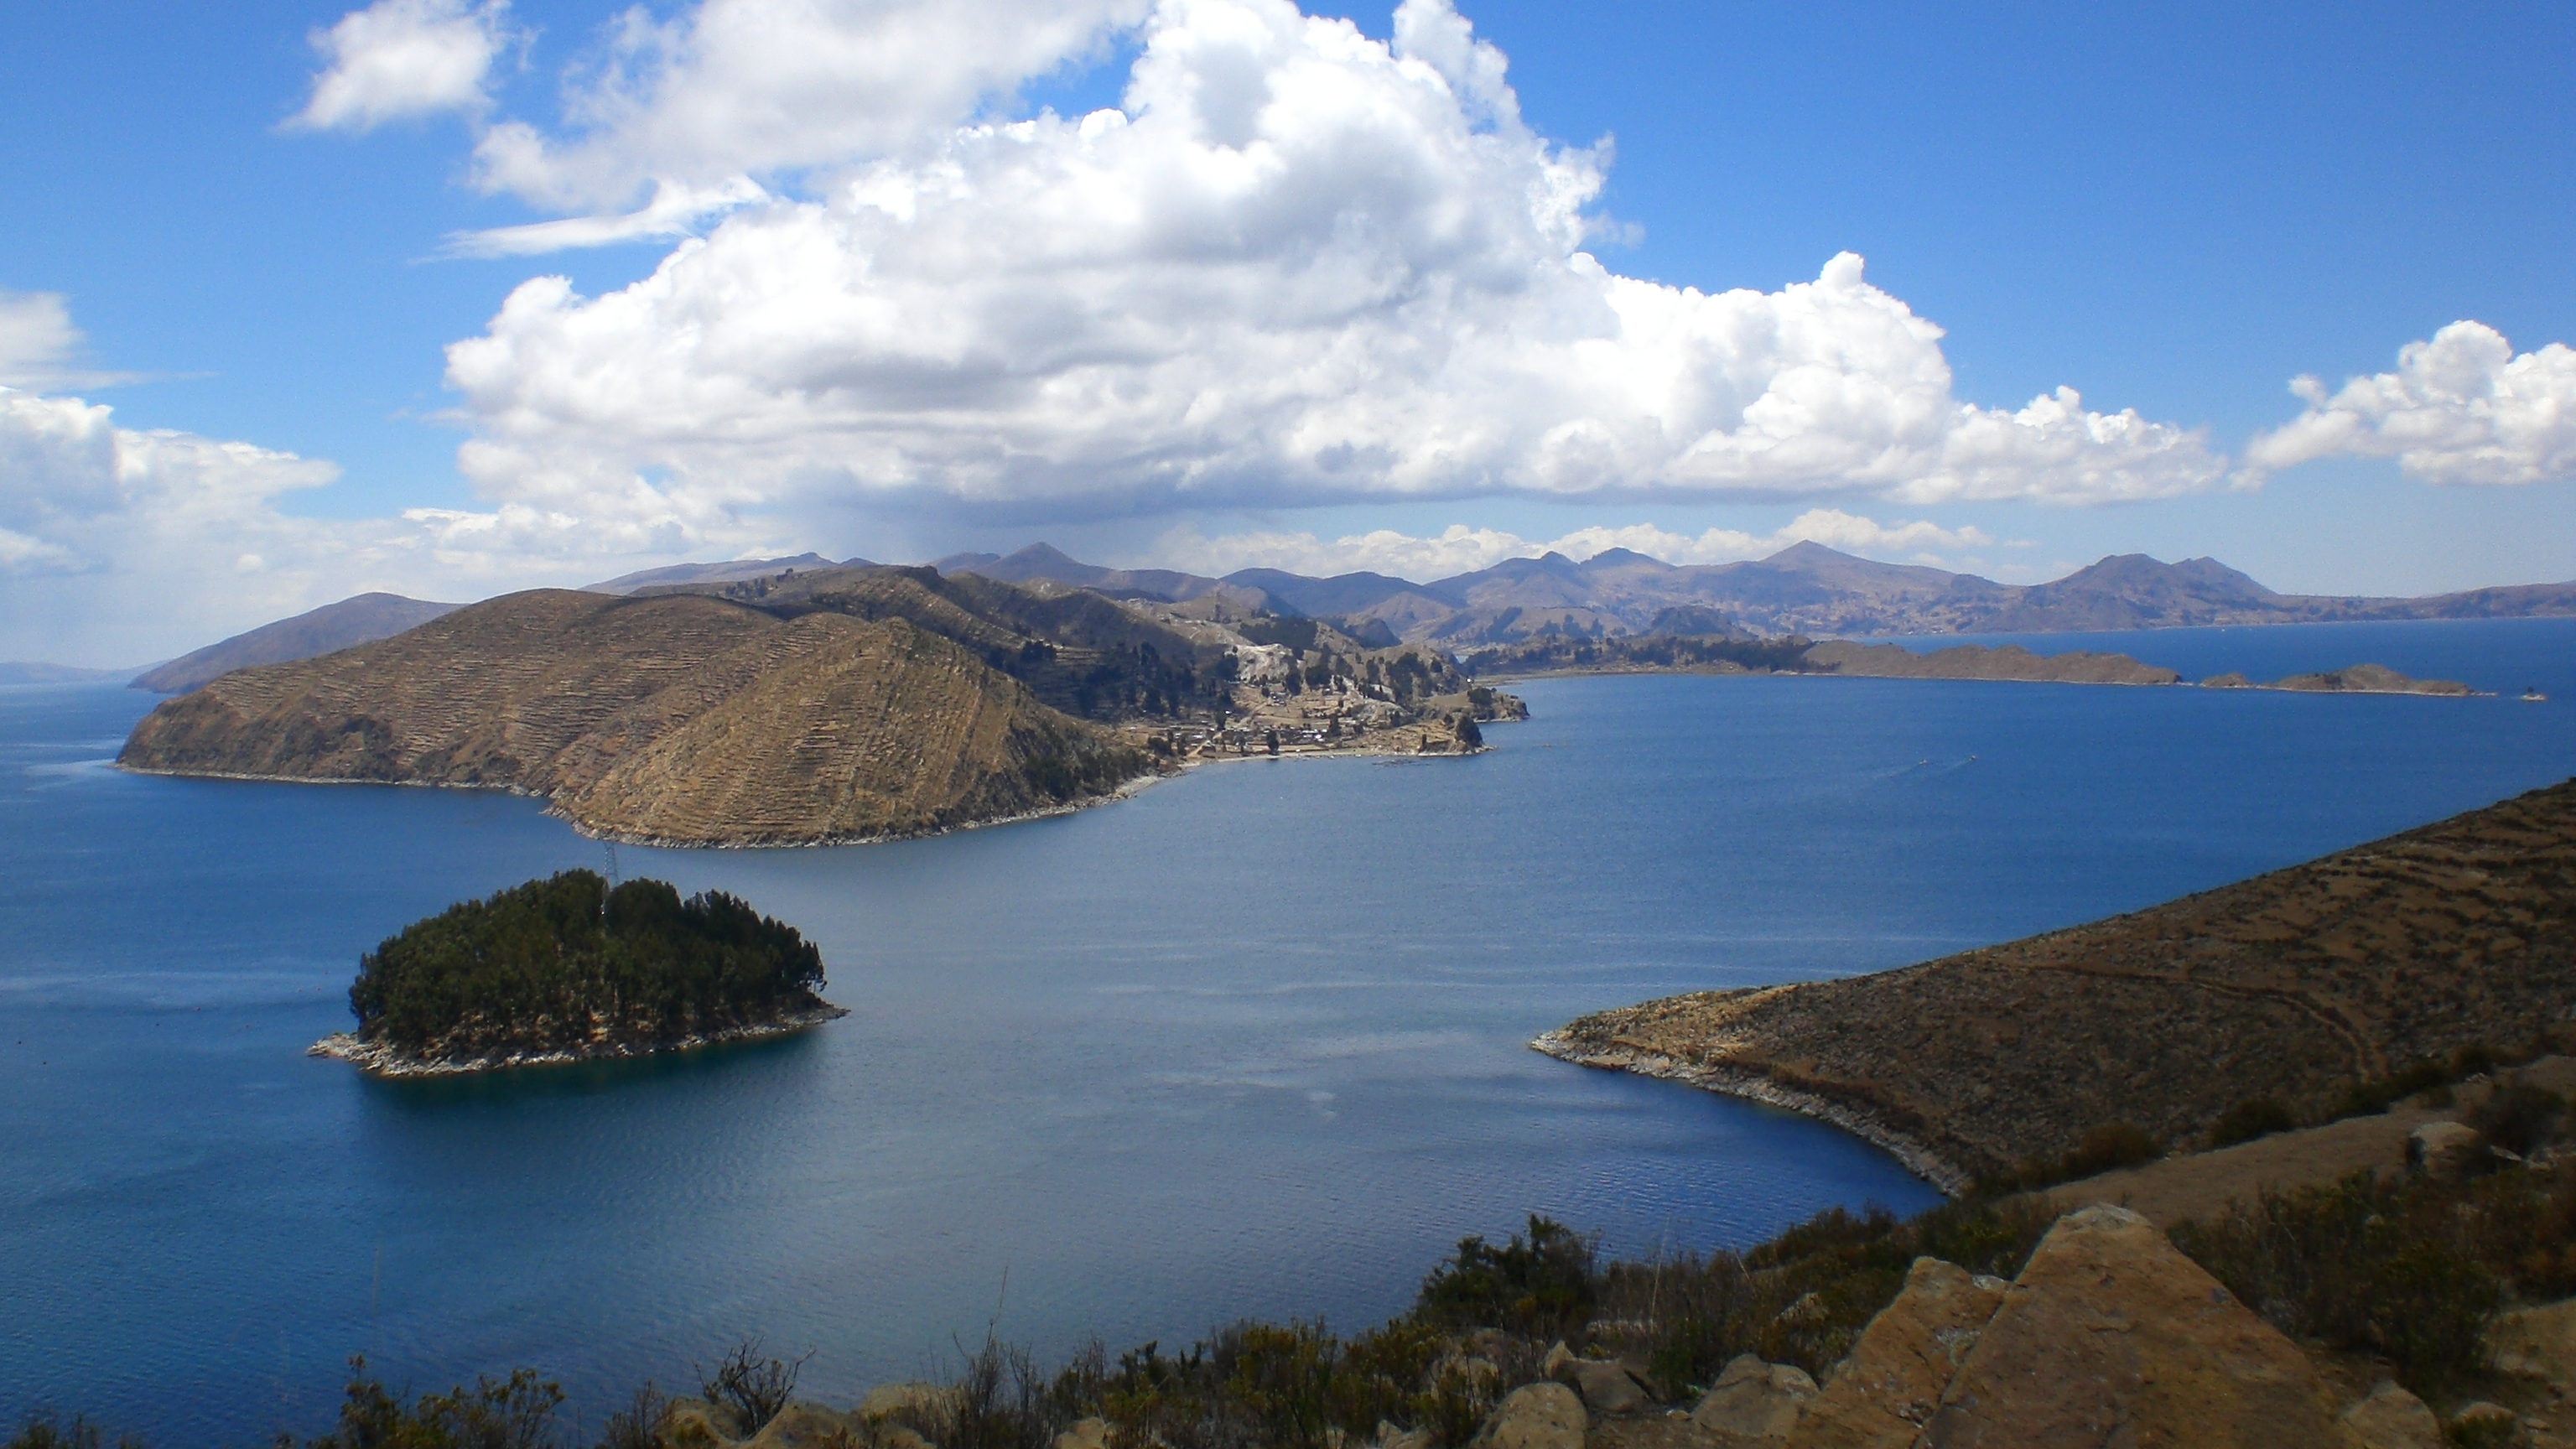 File:Estrecho de Yampupata - Isla del Sol, Lago Titicaca.jpg ...